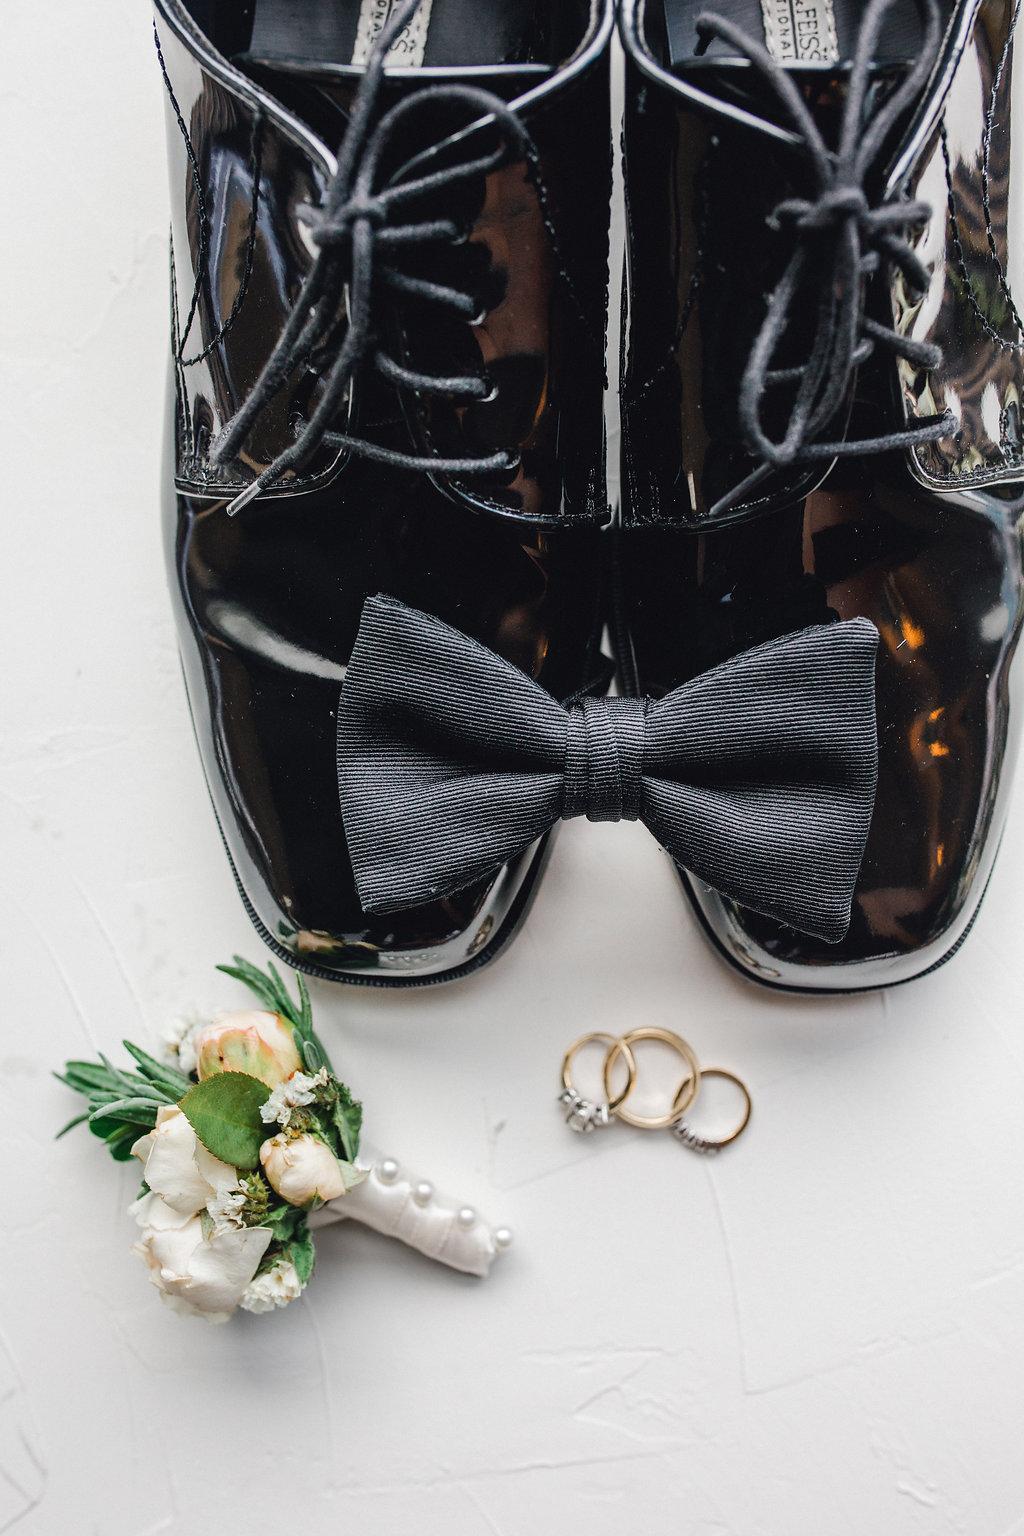 Ault Park Wedding - Cincinnati Wedding Planner